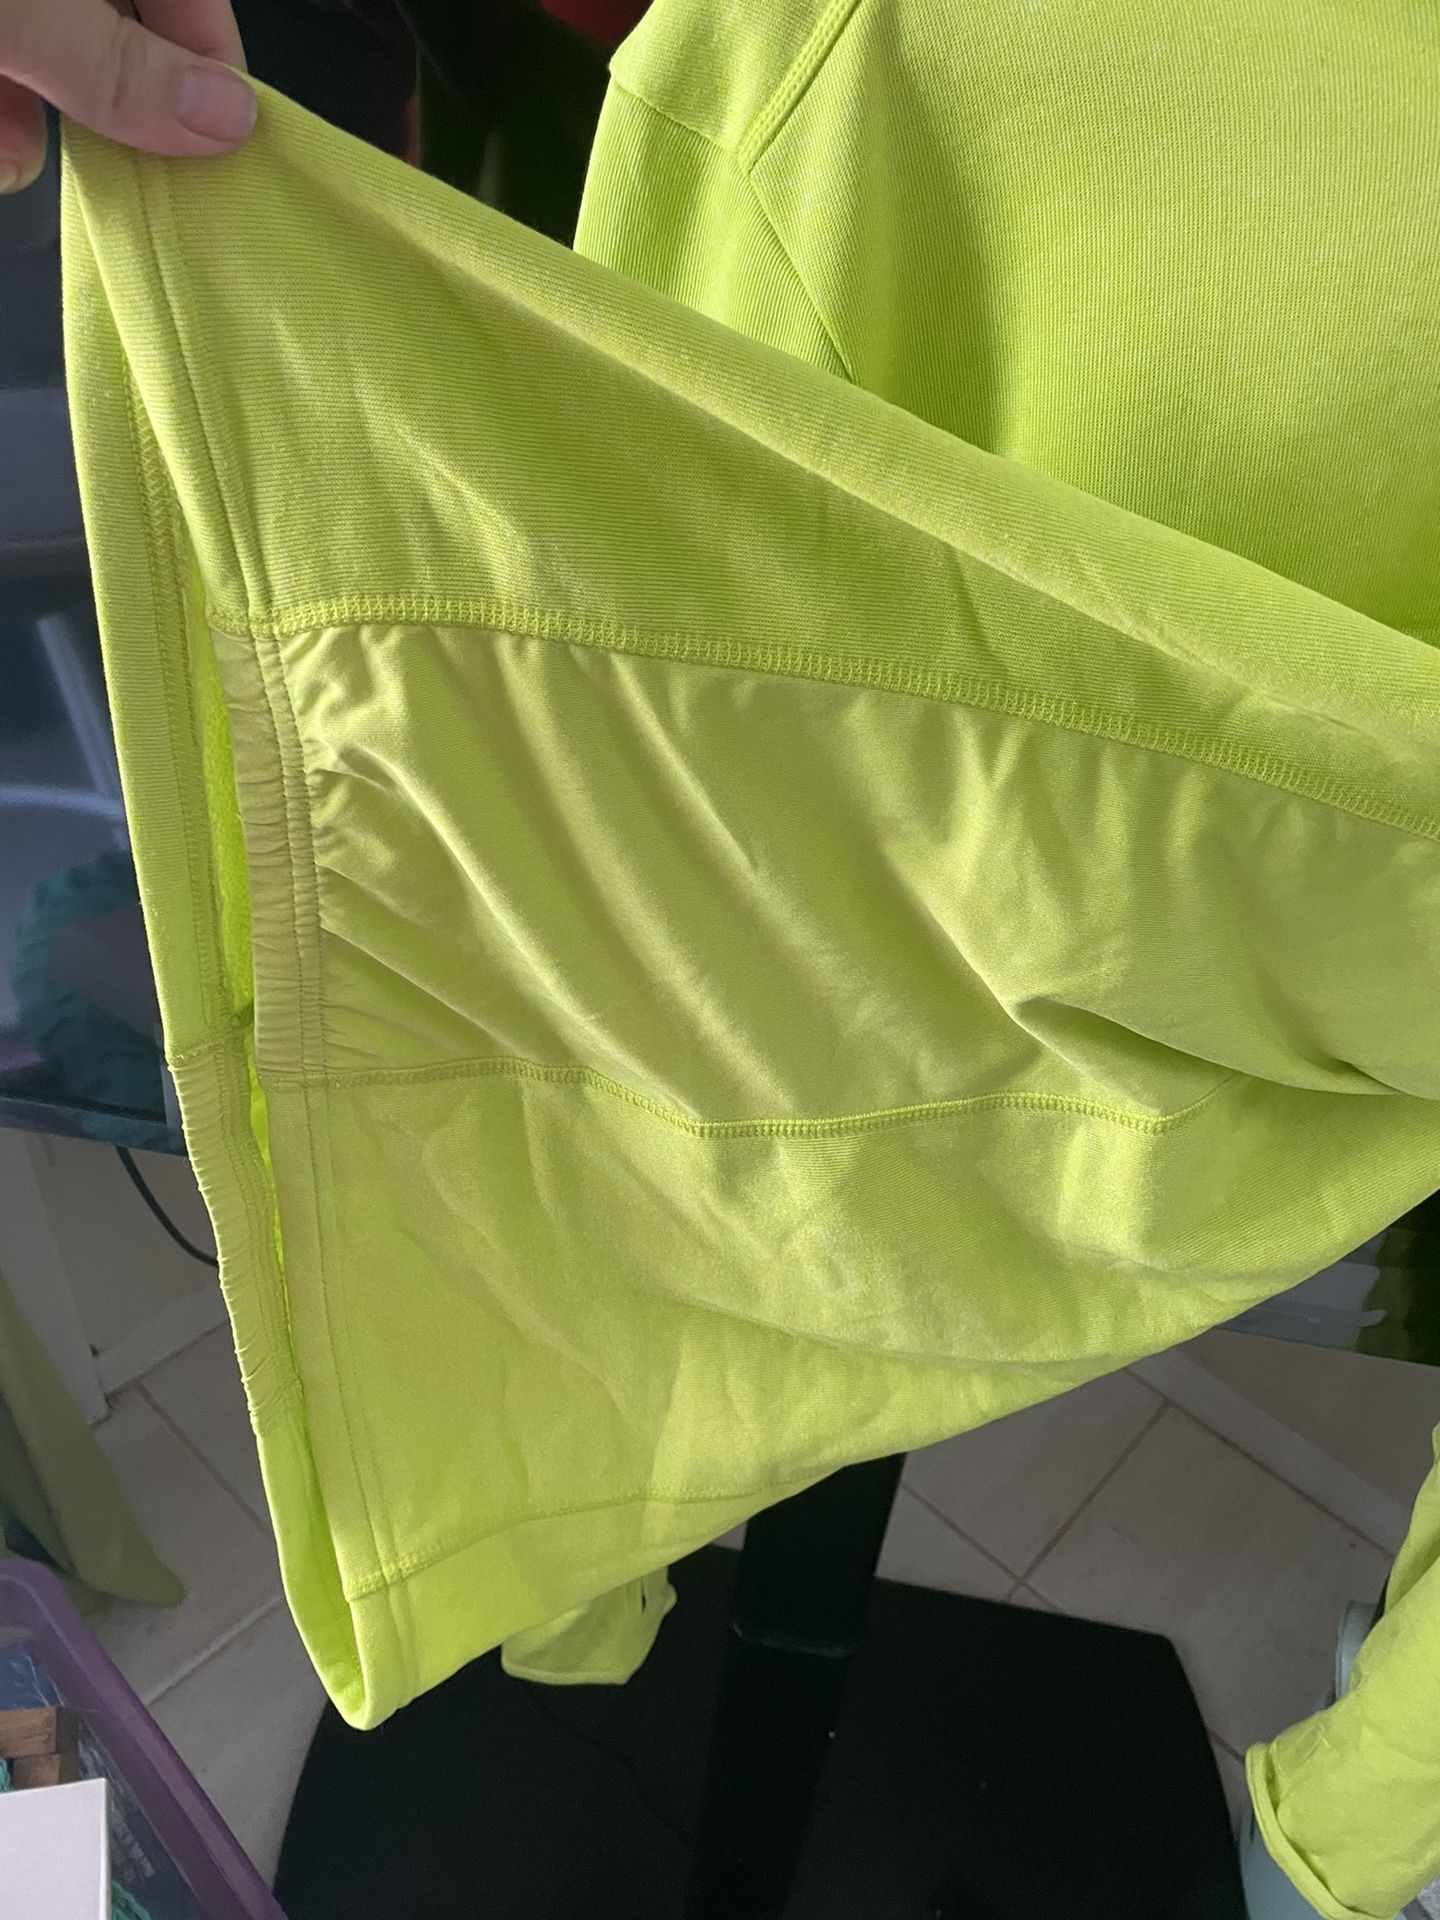 Adidas Neon Yellow/Green Light Weight Sweatshirt Hoodie NWOT